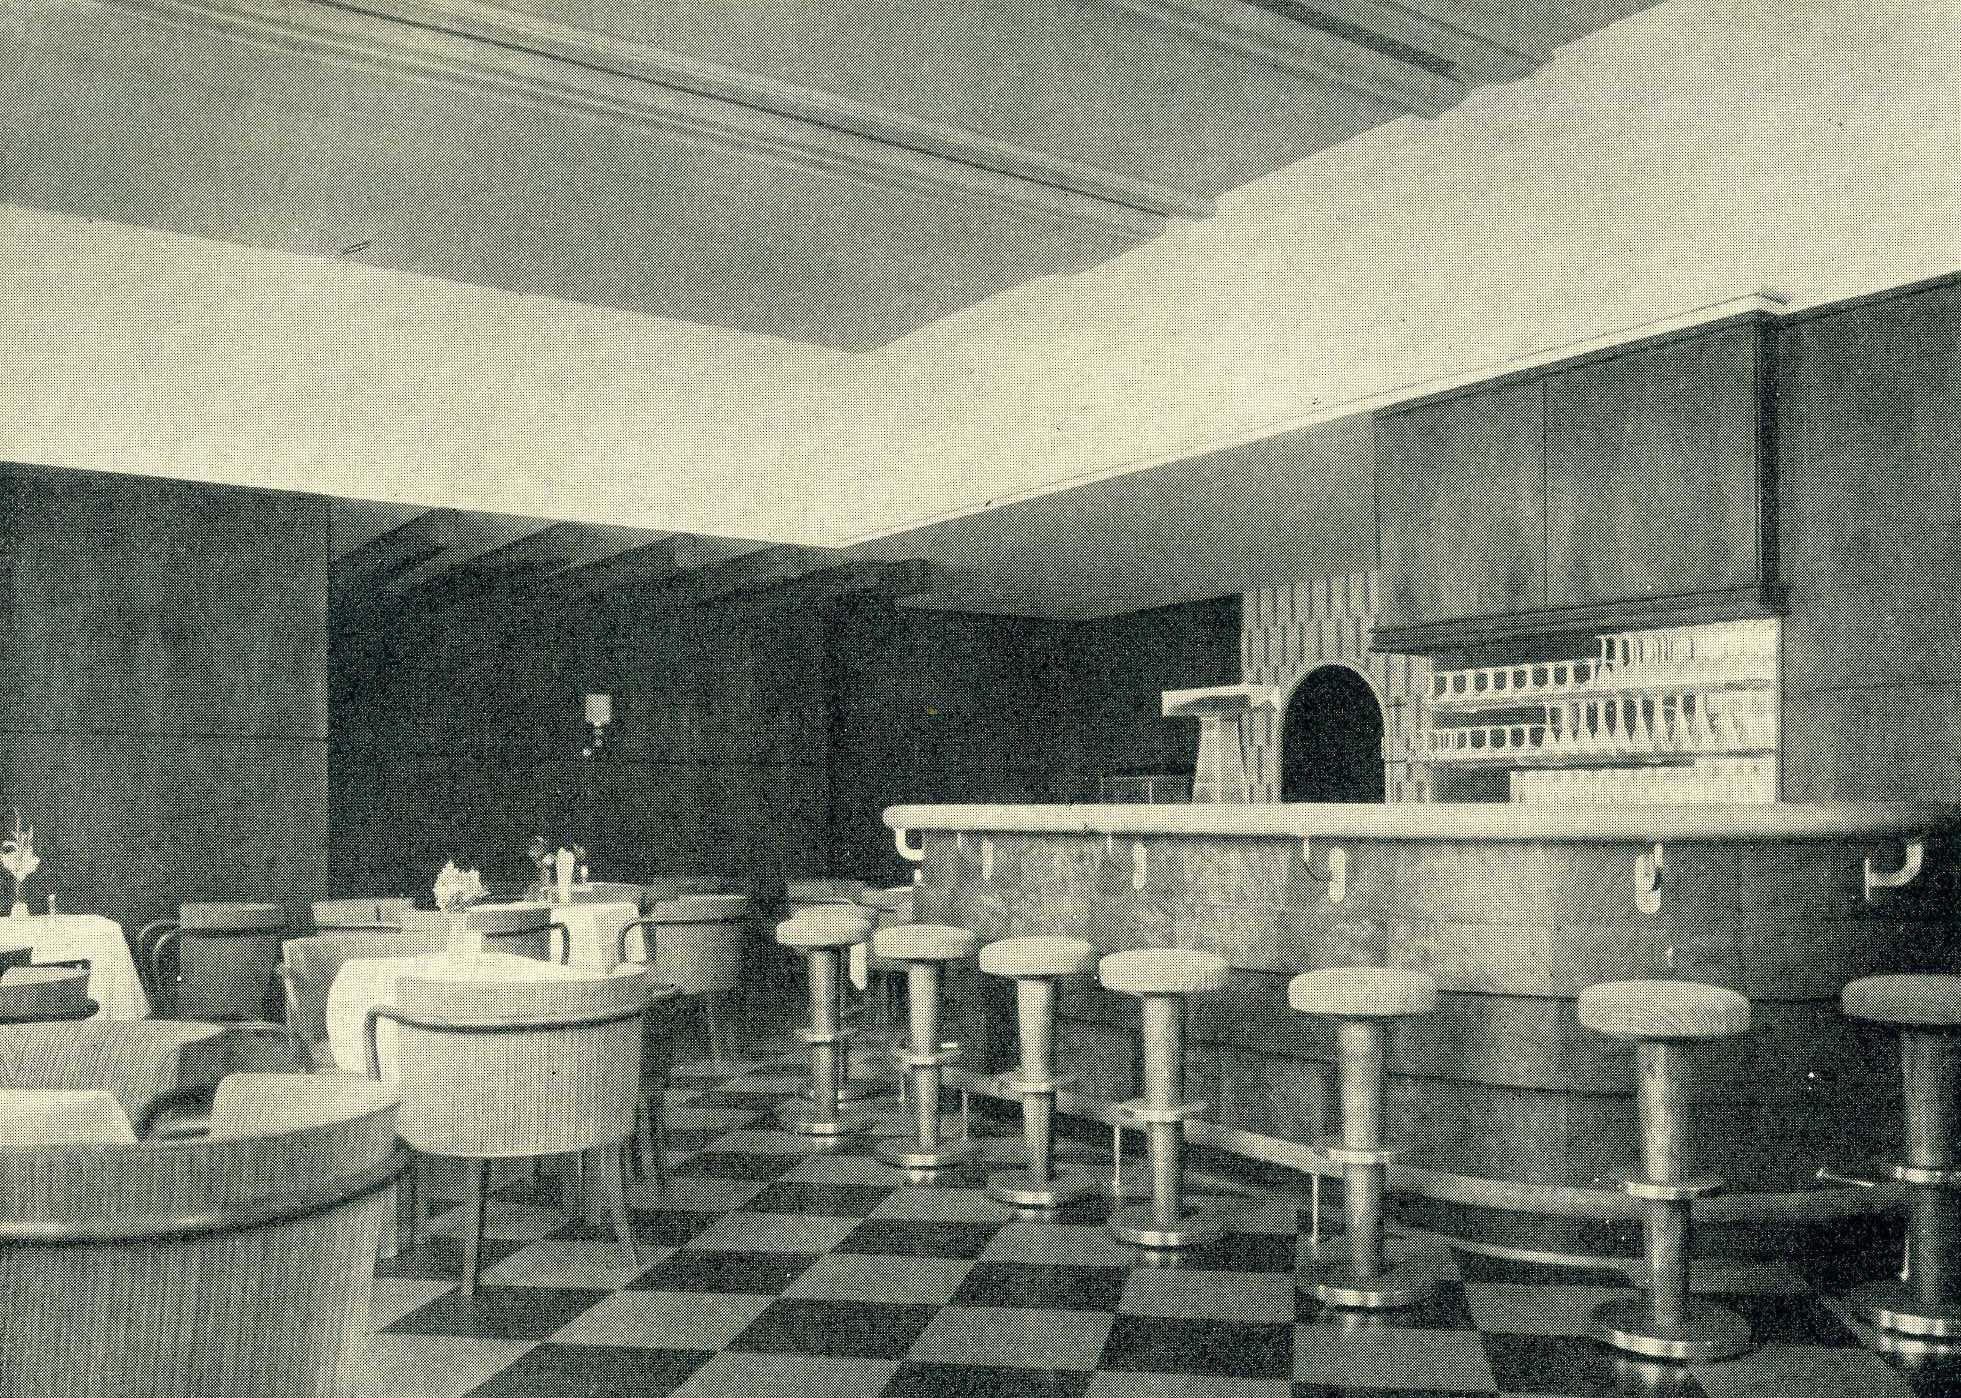 Breidenbacher Hof A Capella Hotel Konigsallee   D Ef Bf Bdsseldorf